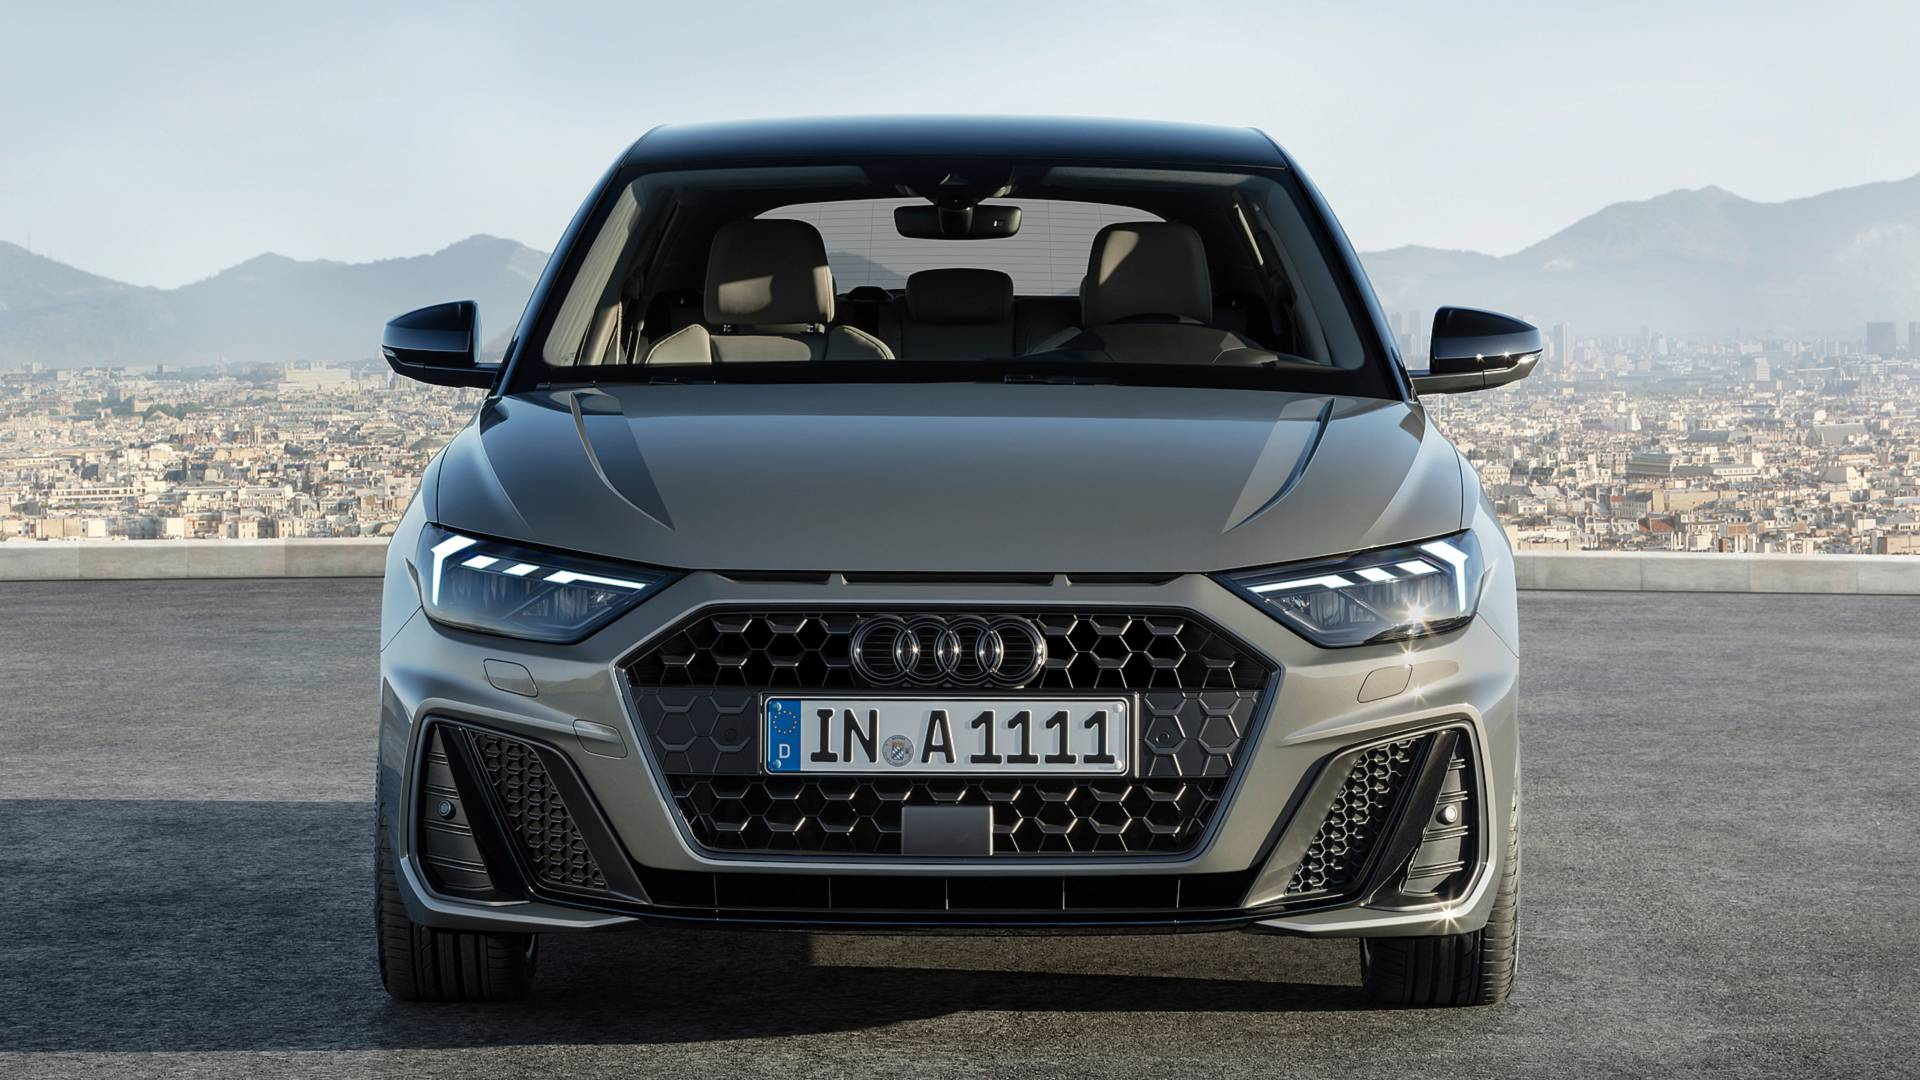 2019 audi a1 sportback revealed 40 tfsi boasts 2 0 liter engine with 200 ps autoevolution. Black Bedroom Furniture Sets. Home Design Ideas